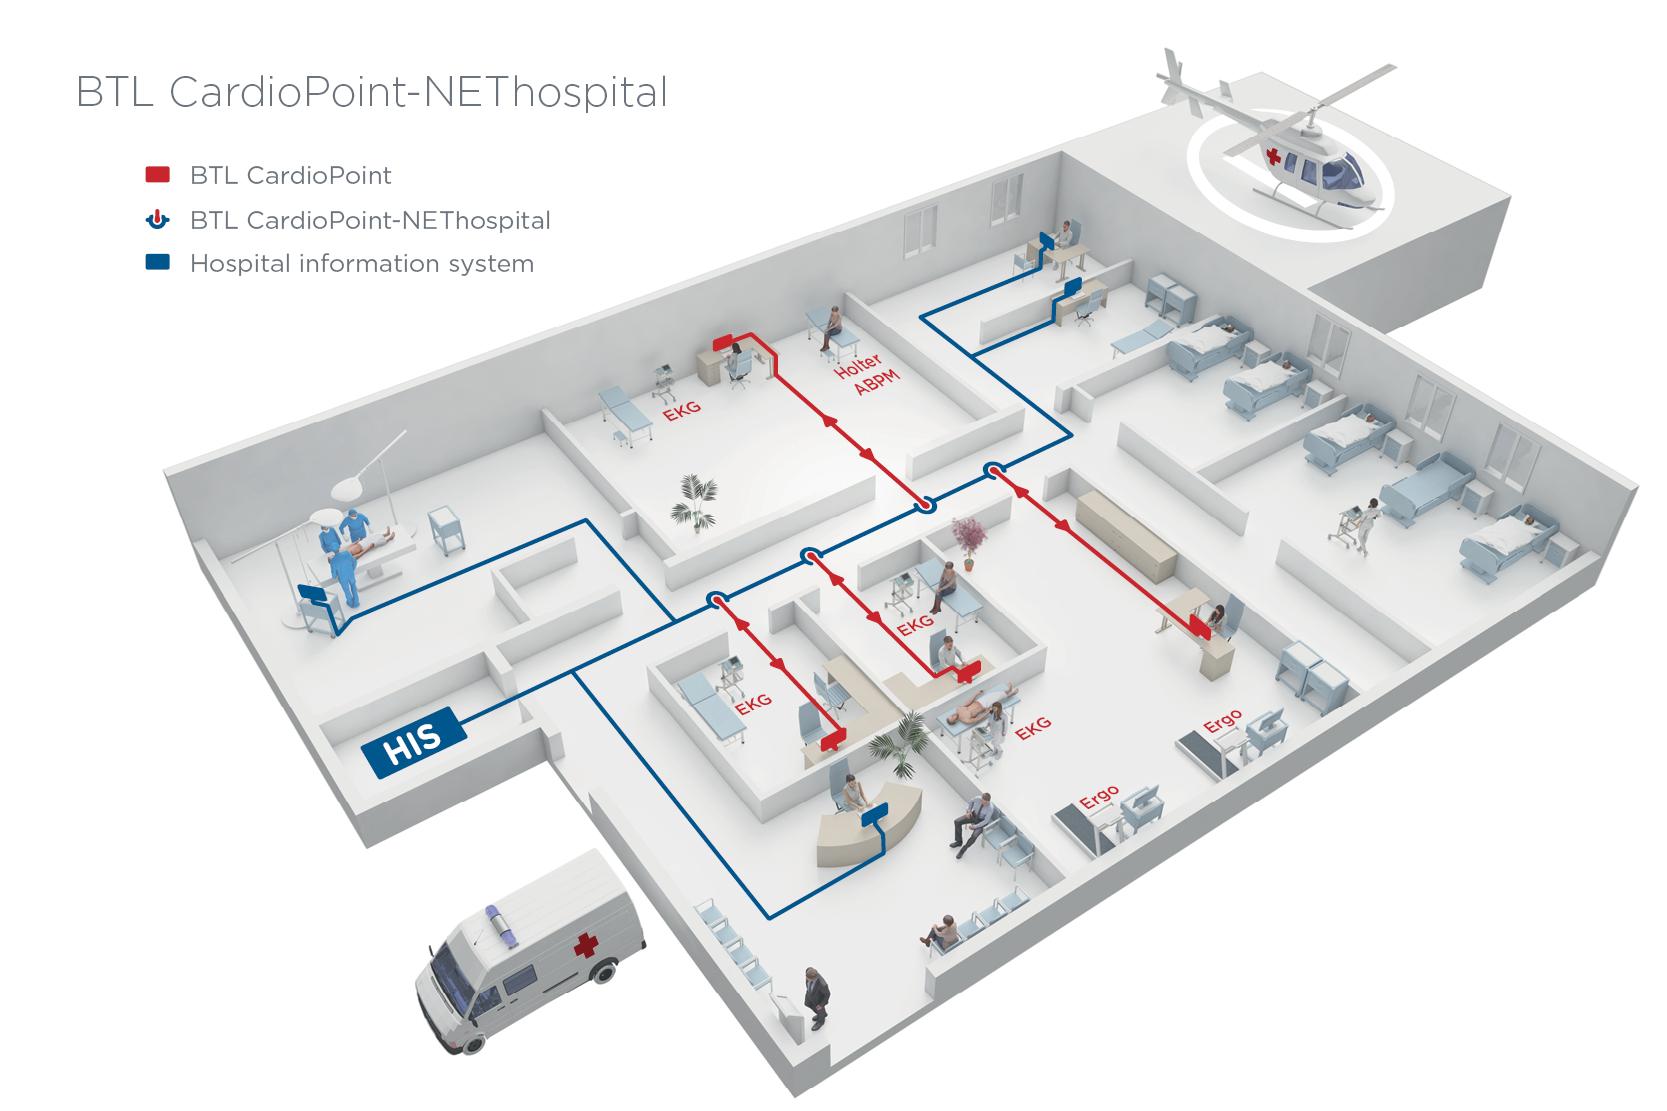 BTL_CardioPoint_NEThospital_RO3